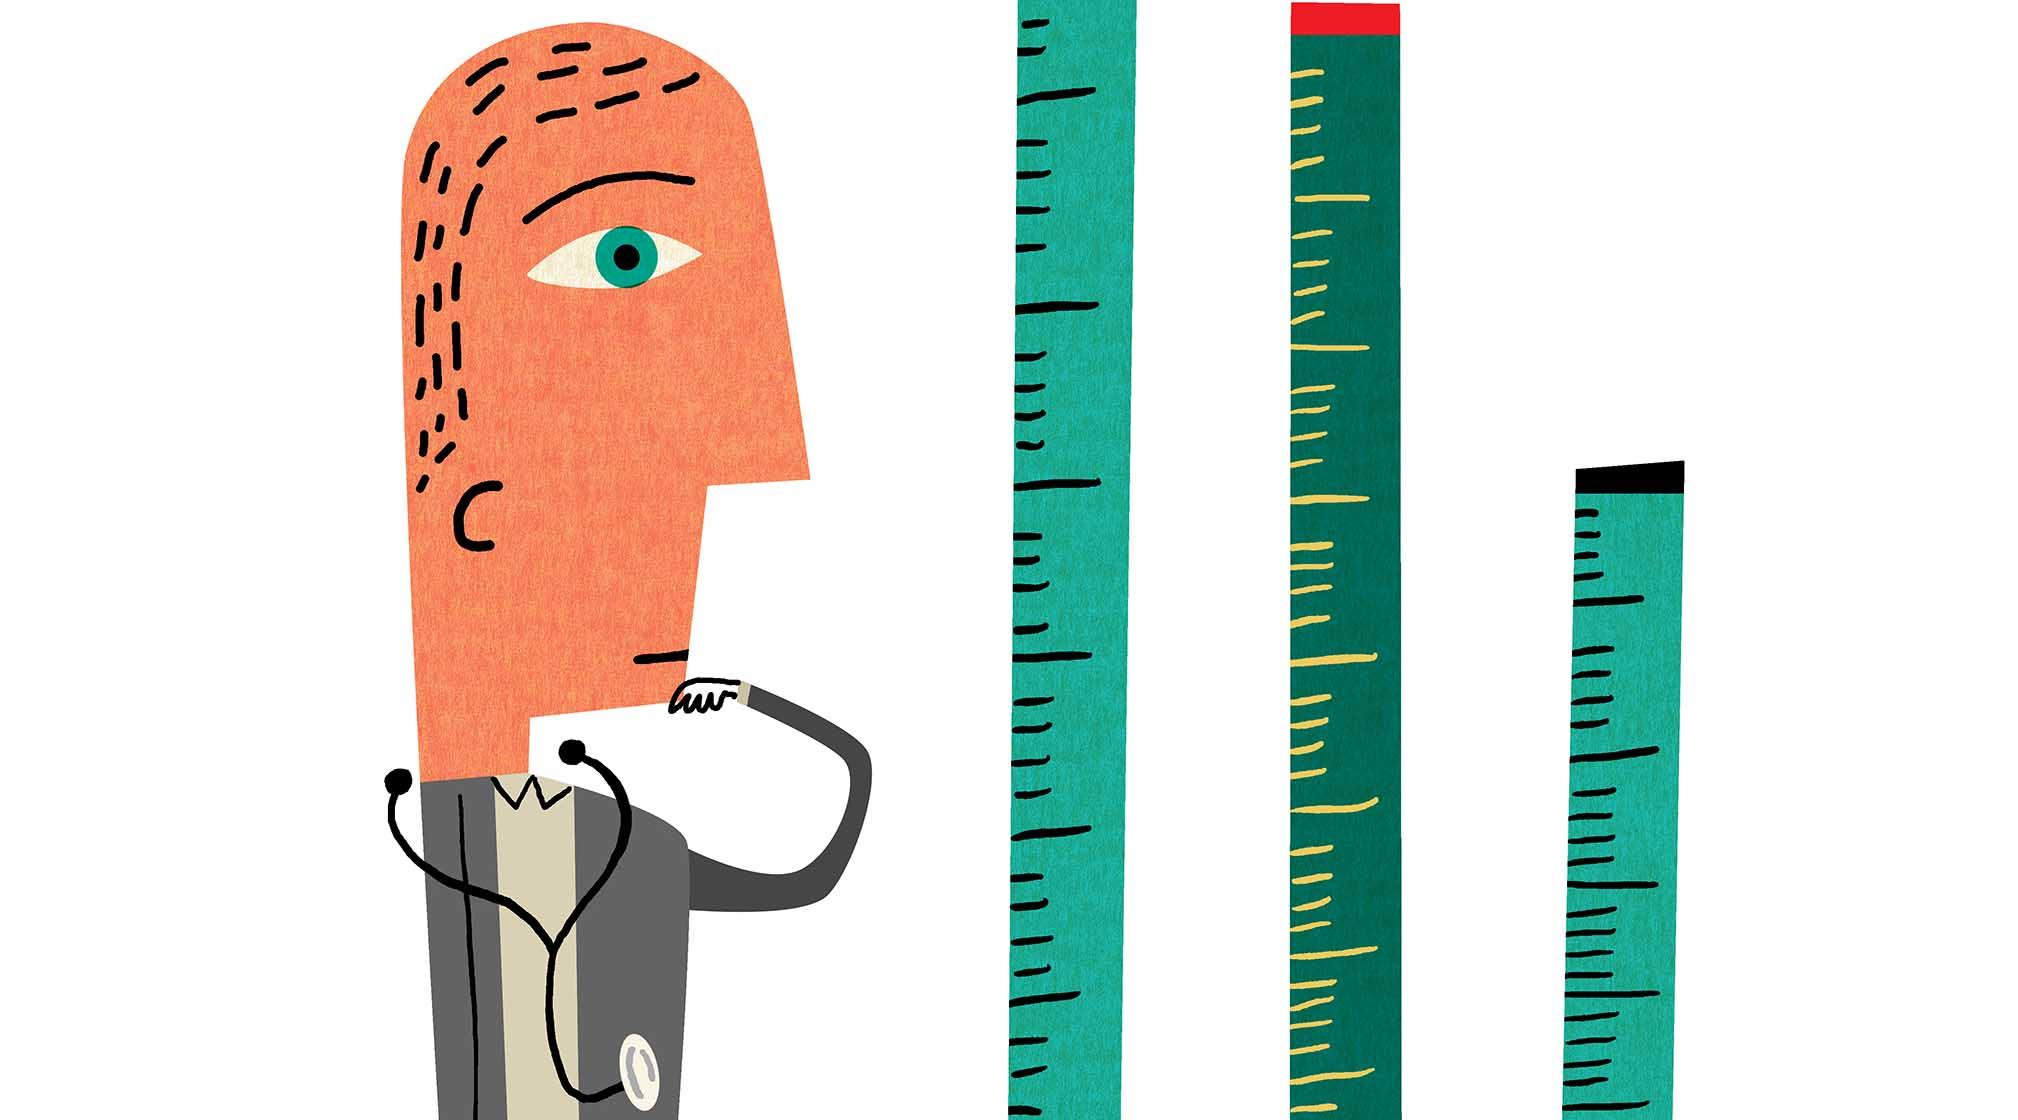 Illustration of a man looking at measuring sticks